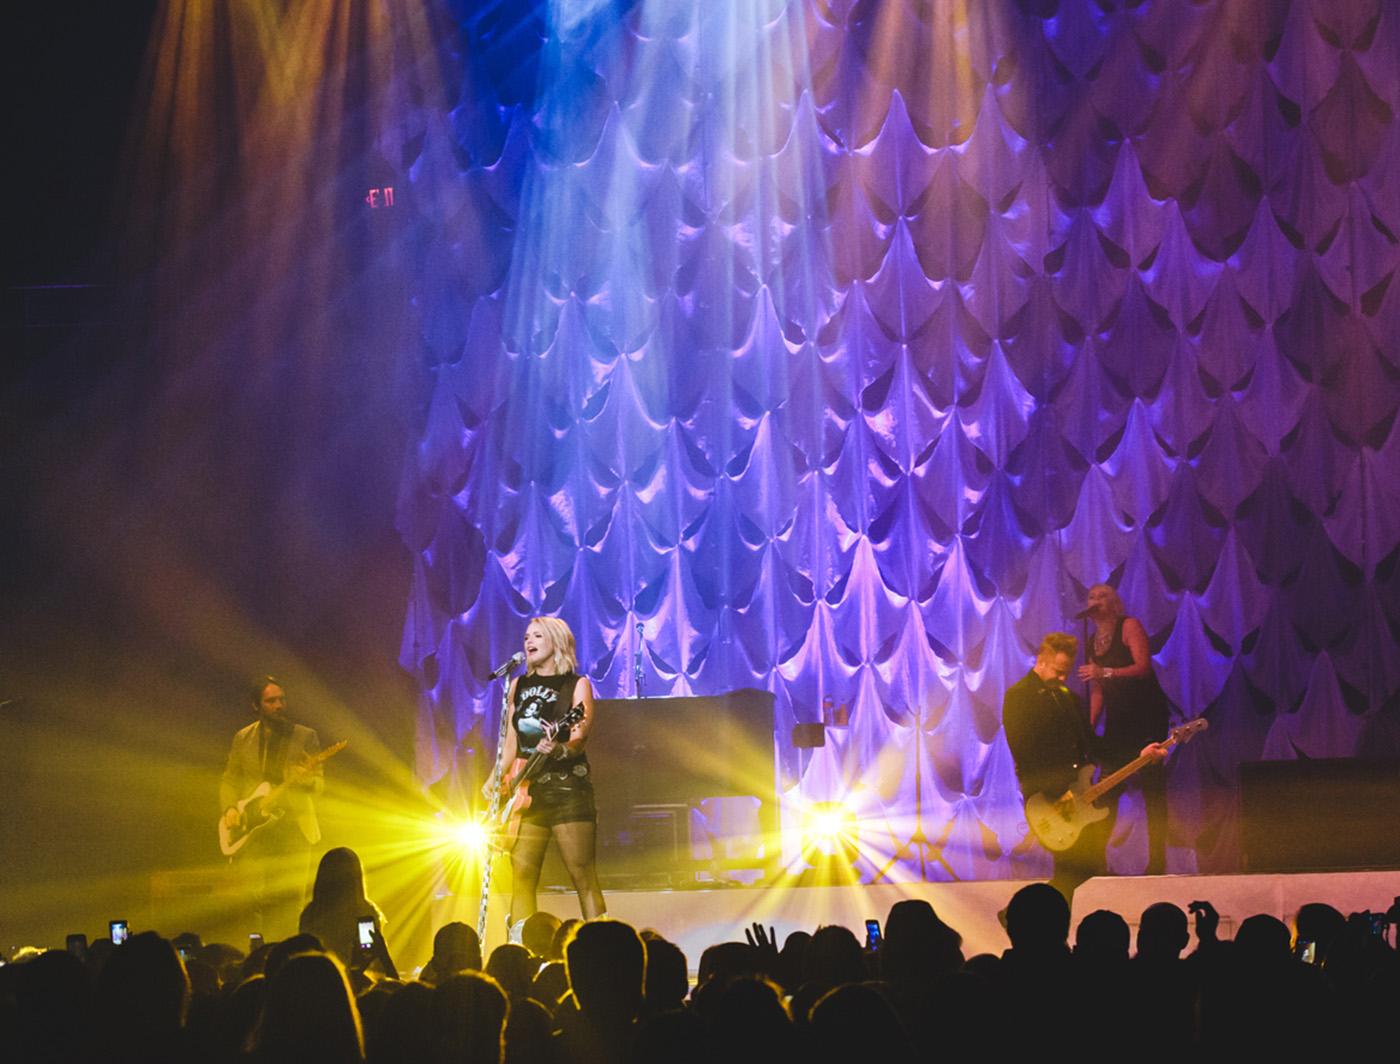 Batty on the Miranda Lambert Tour